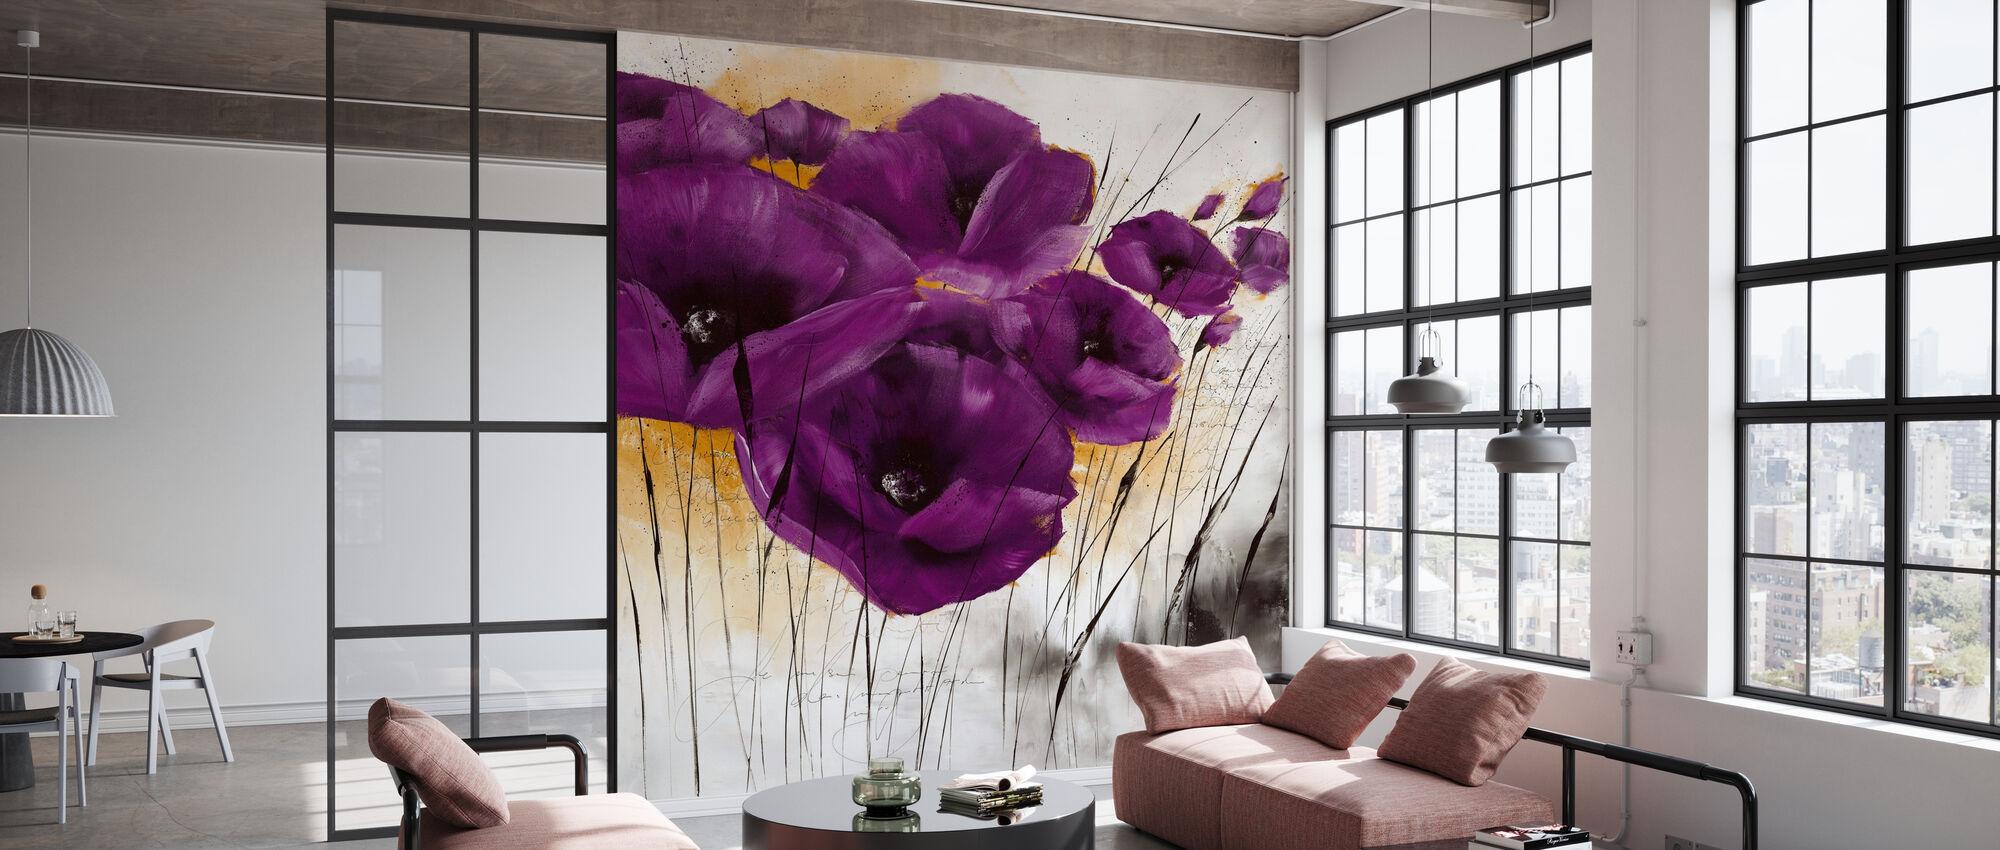 Pavot violet IV - Wallpaper - Office